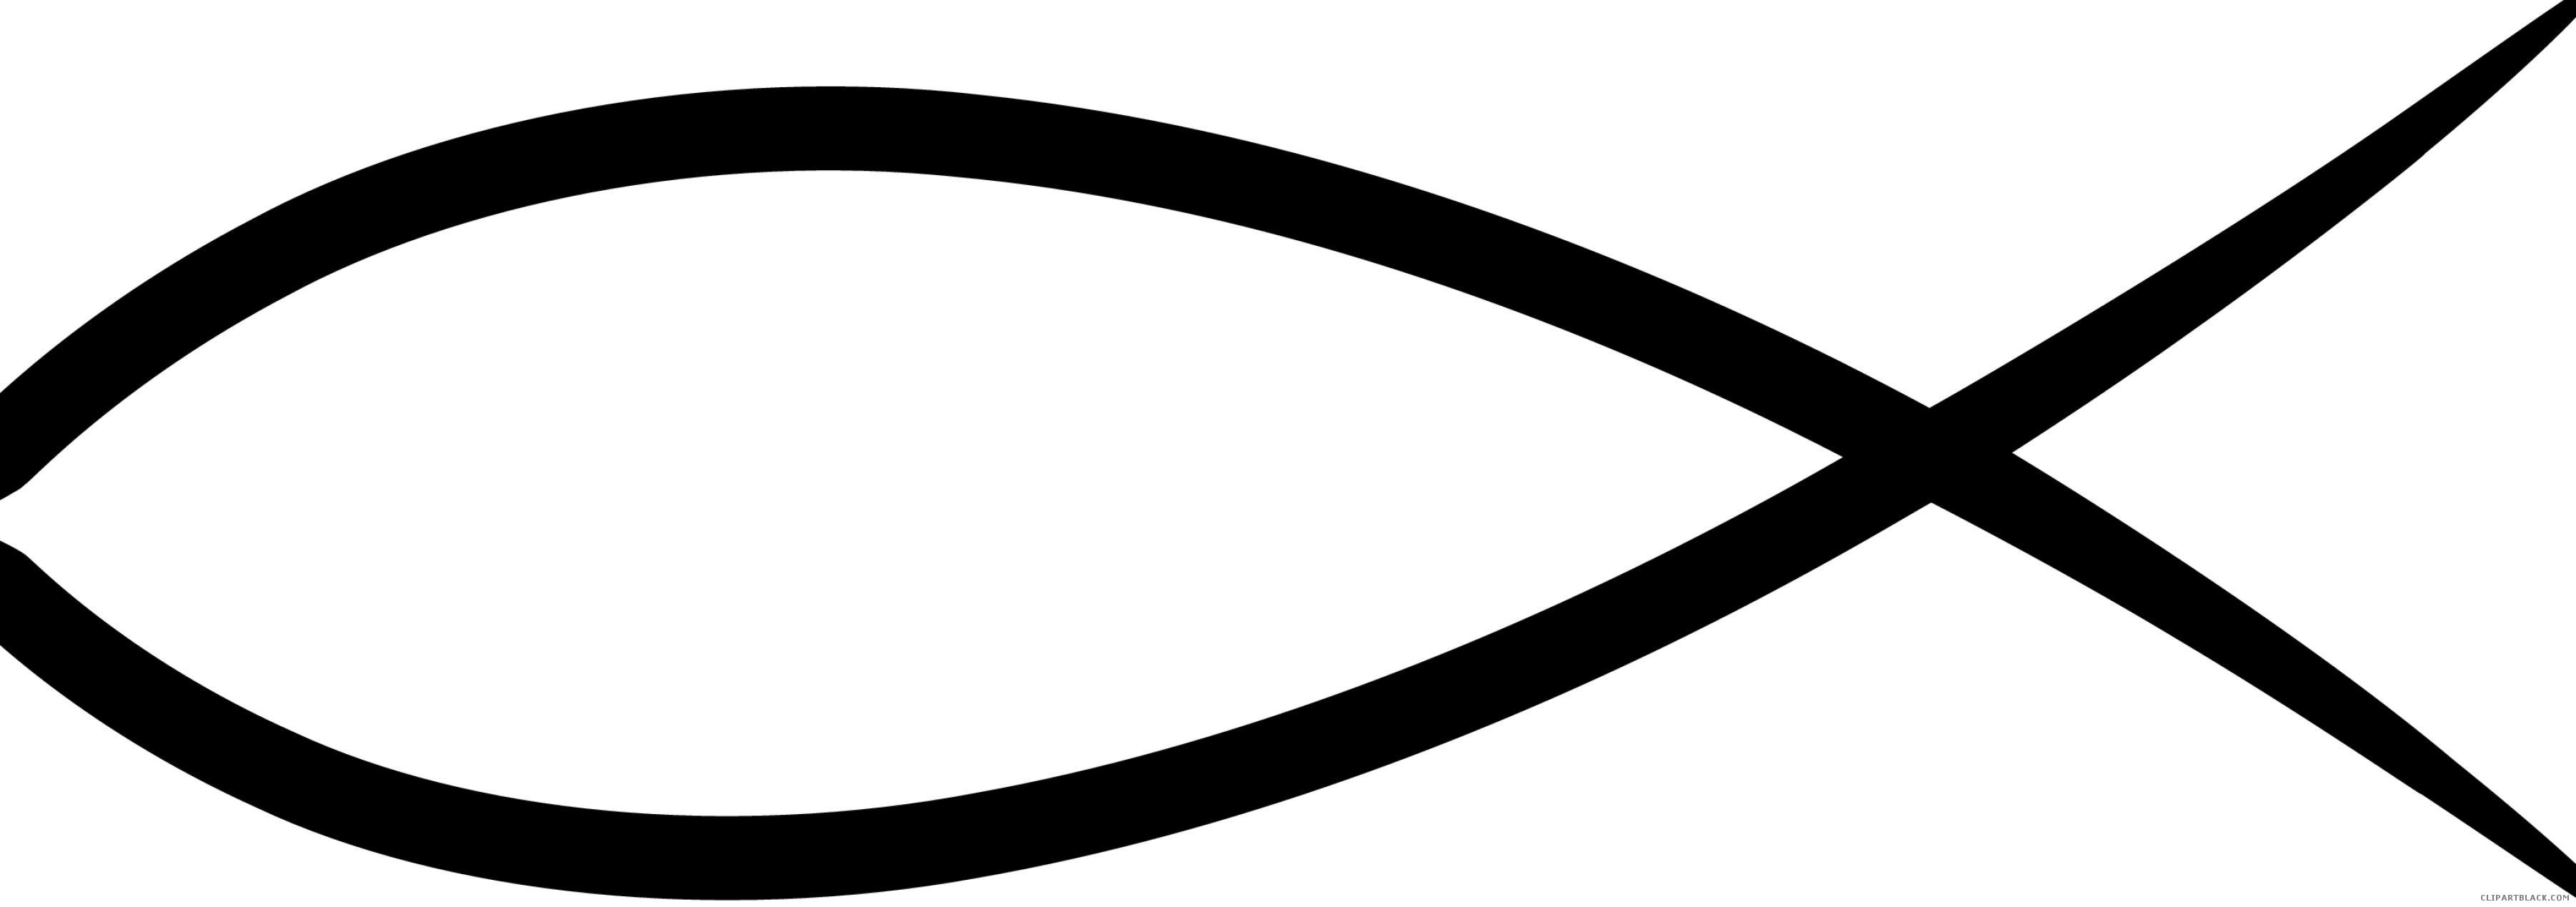 Symbol clipartblack com animal. Christian clipart fish